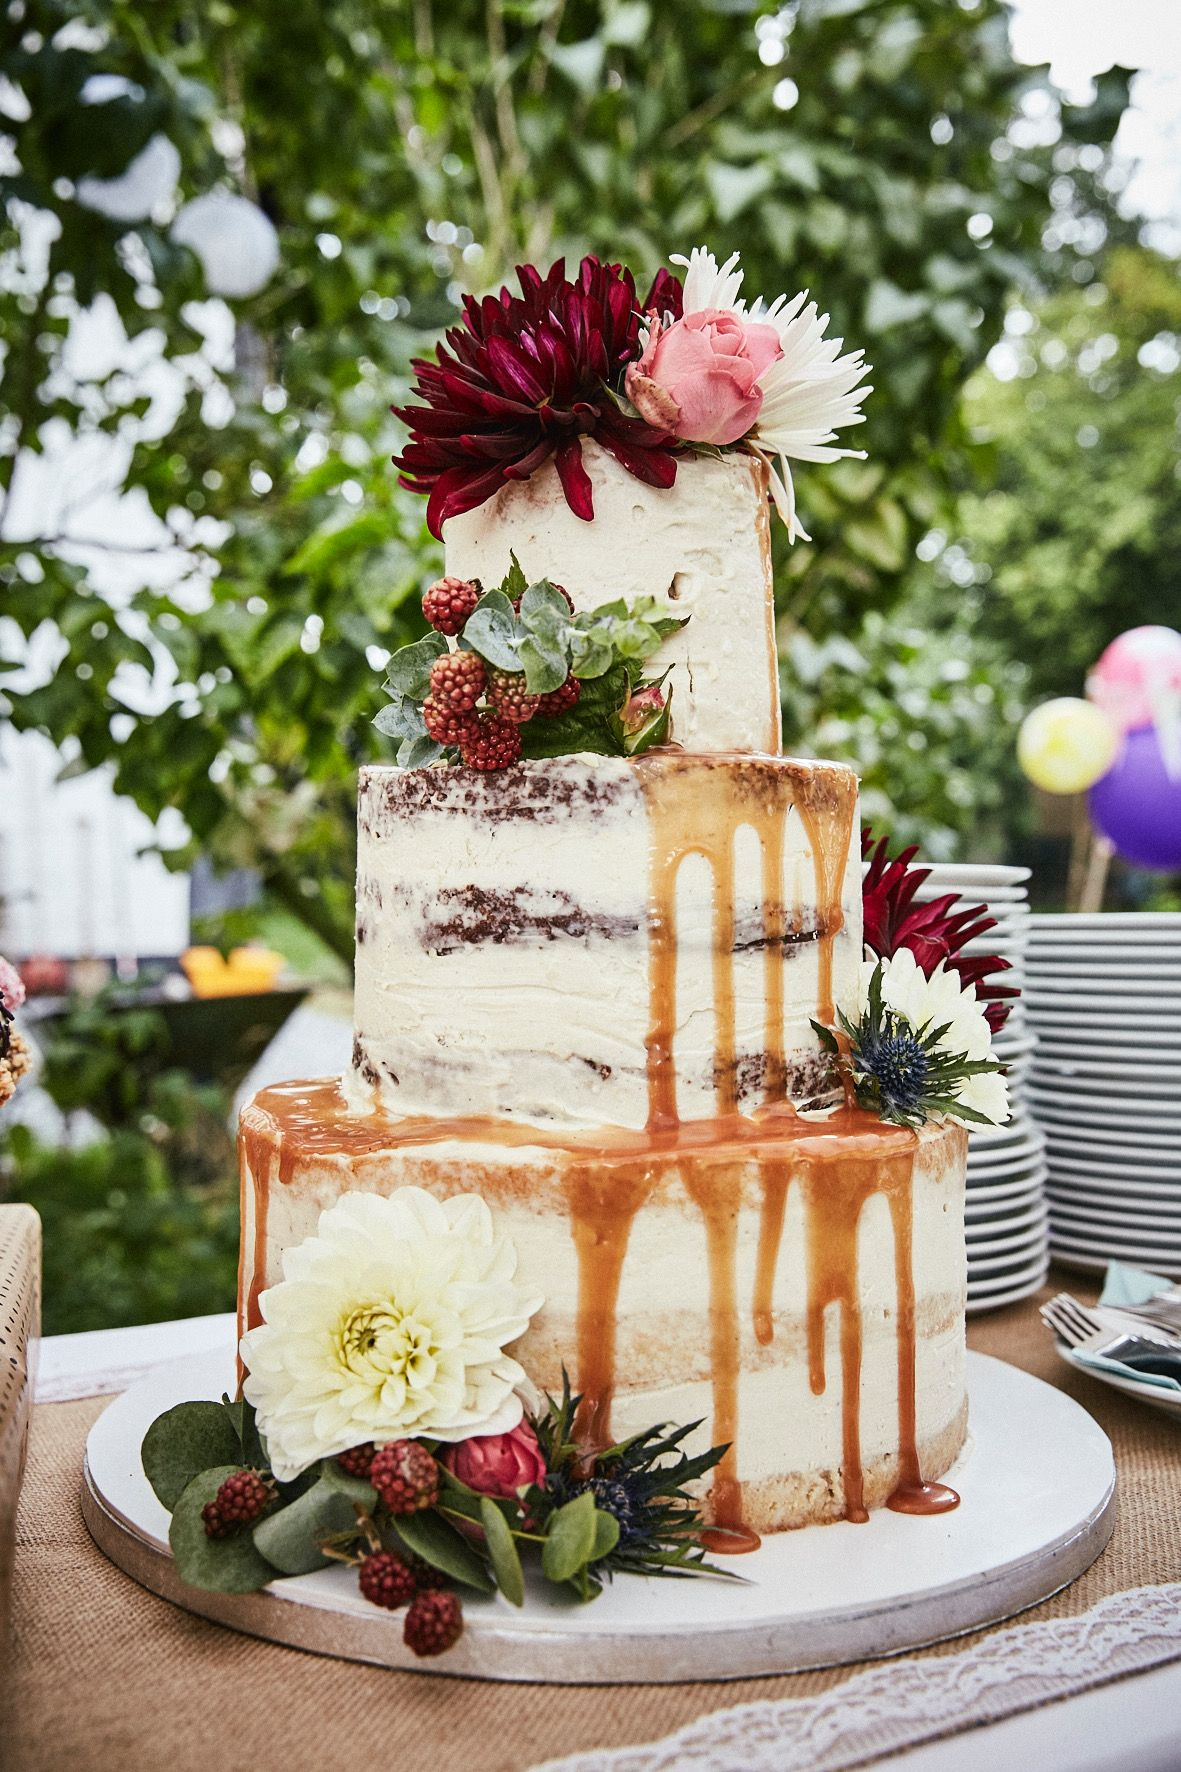 Semi Naked Wedding Cake With Dripping Hochzeitstorte Nakedcake